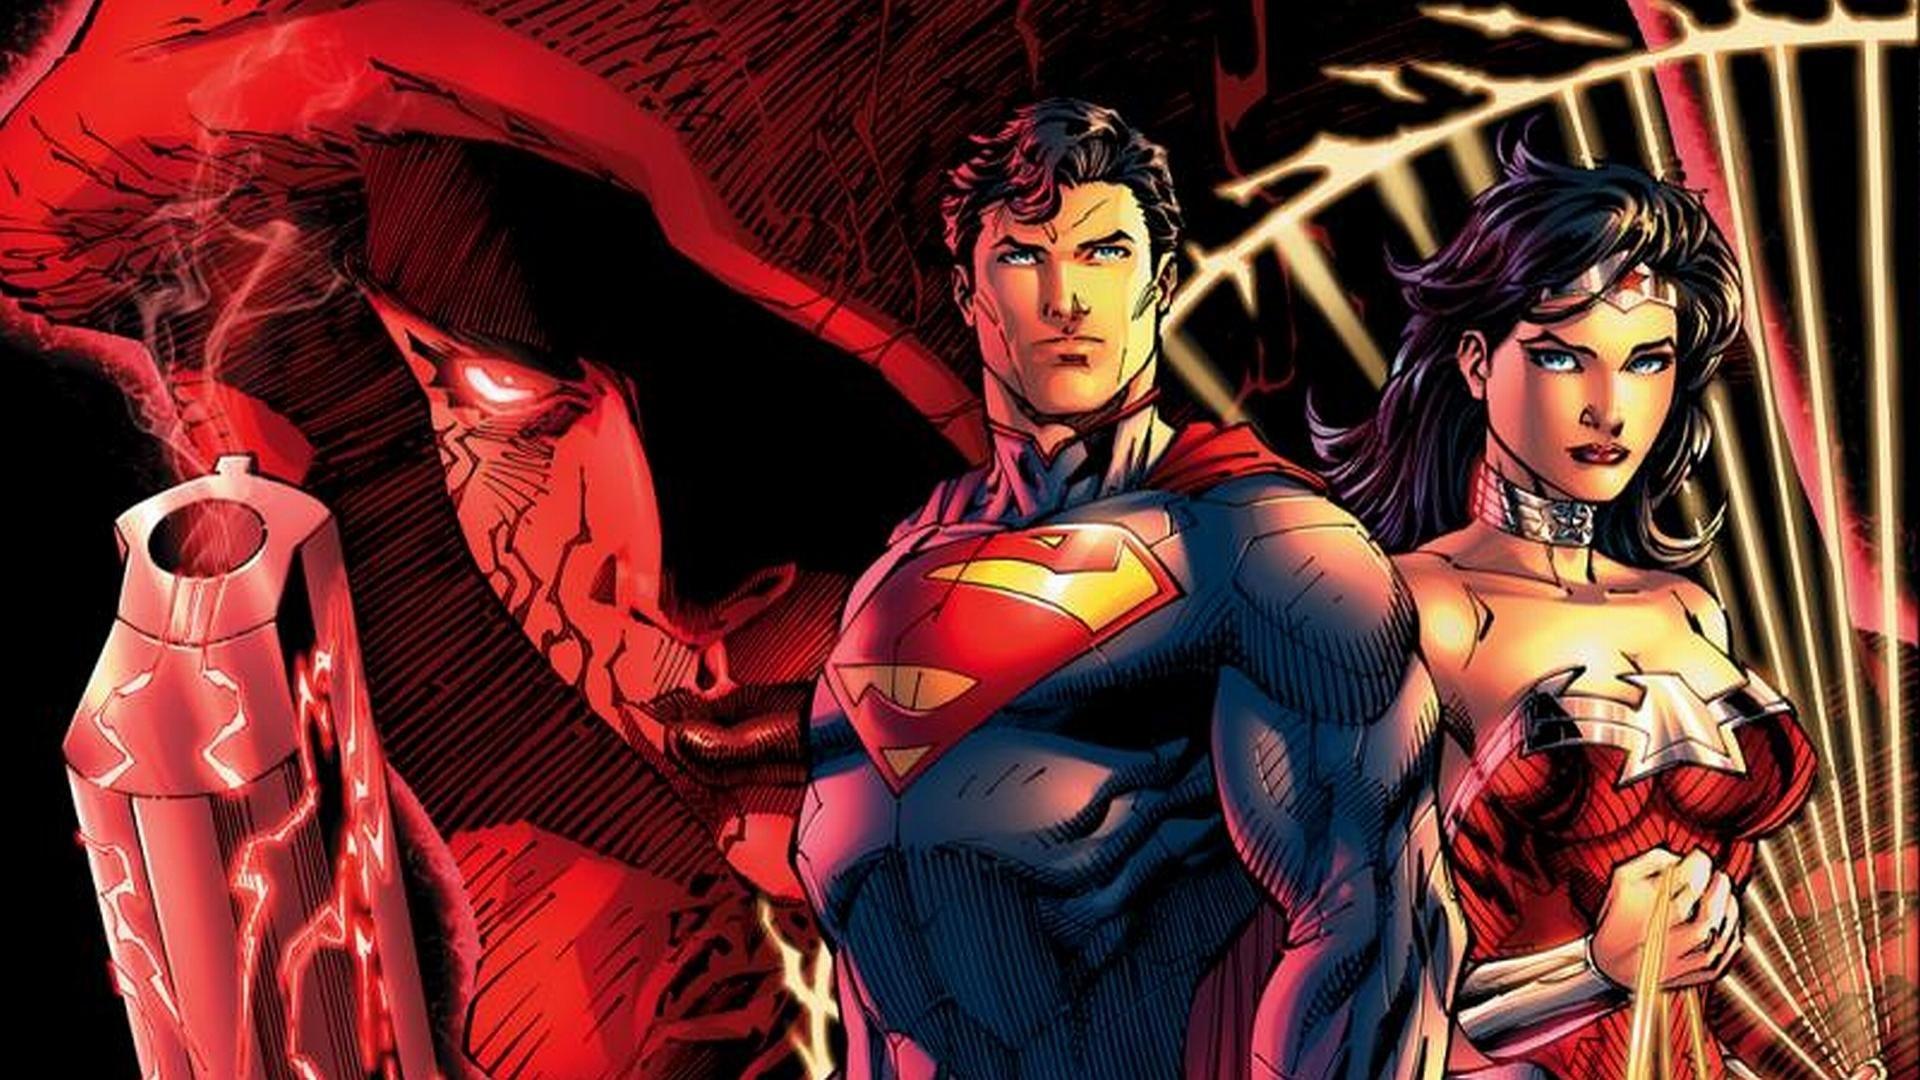 DC Comics wallpapers 1920x1080 Full HD (1080p) desktop ...